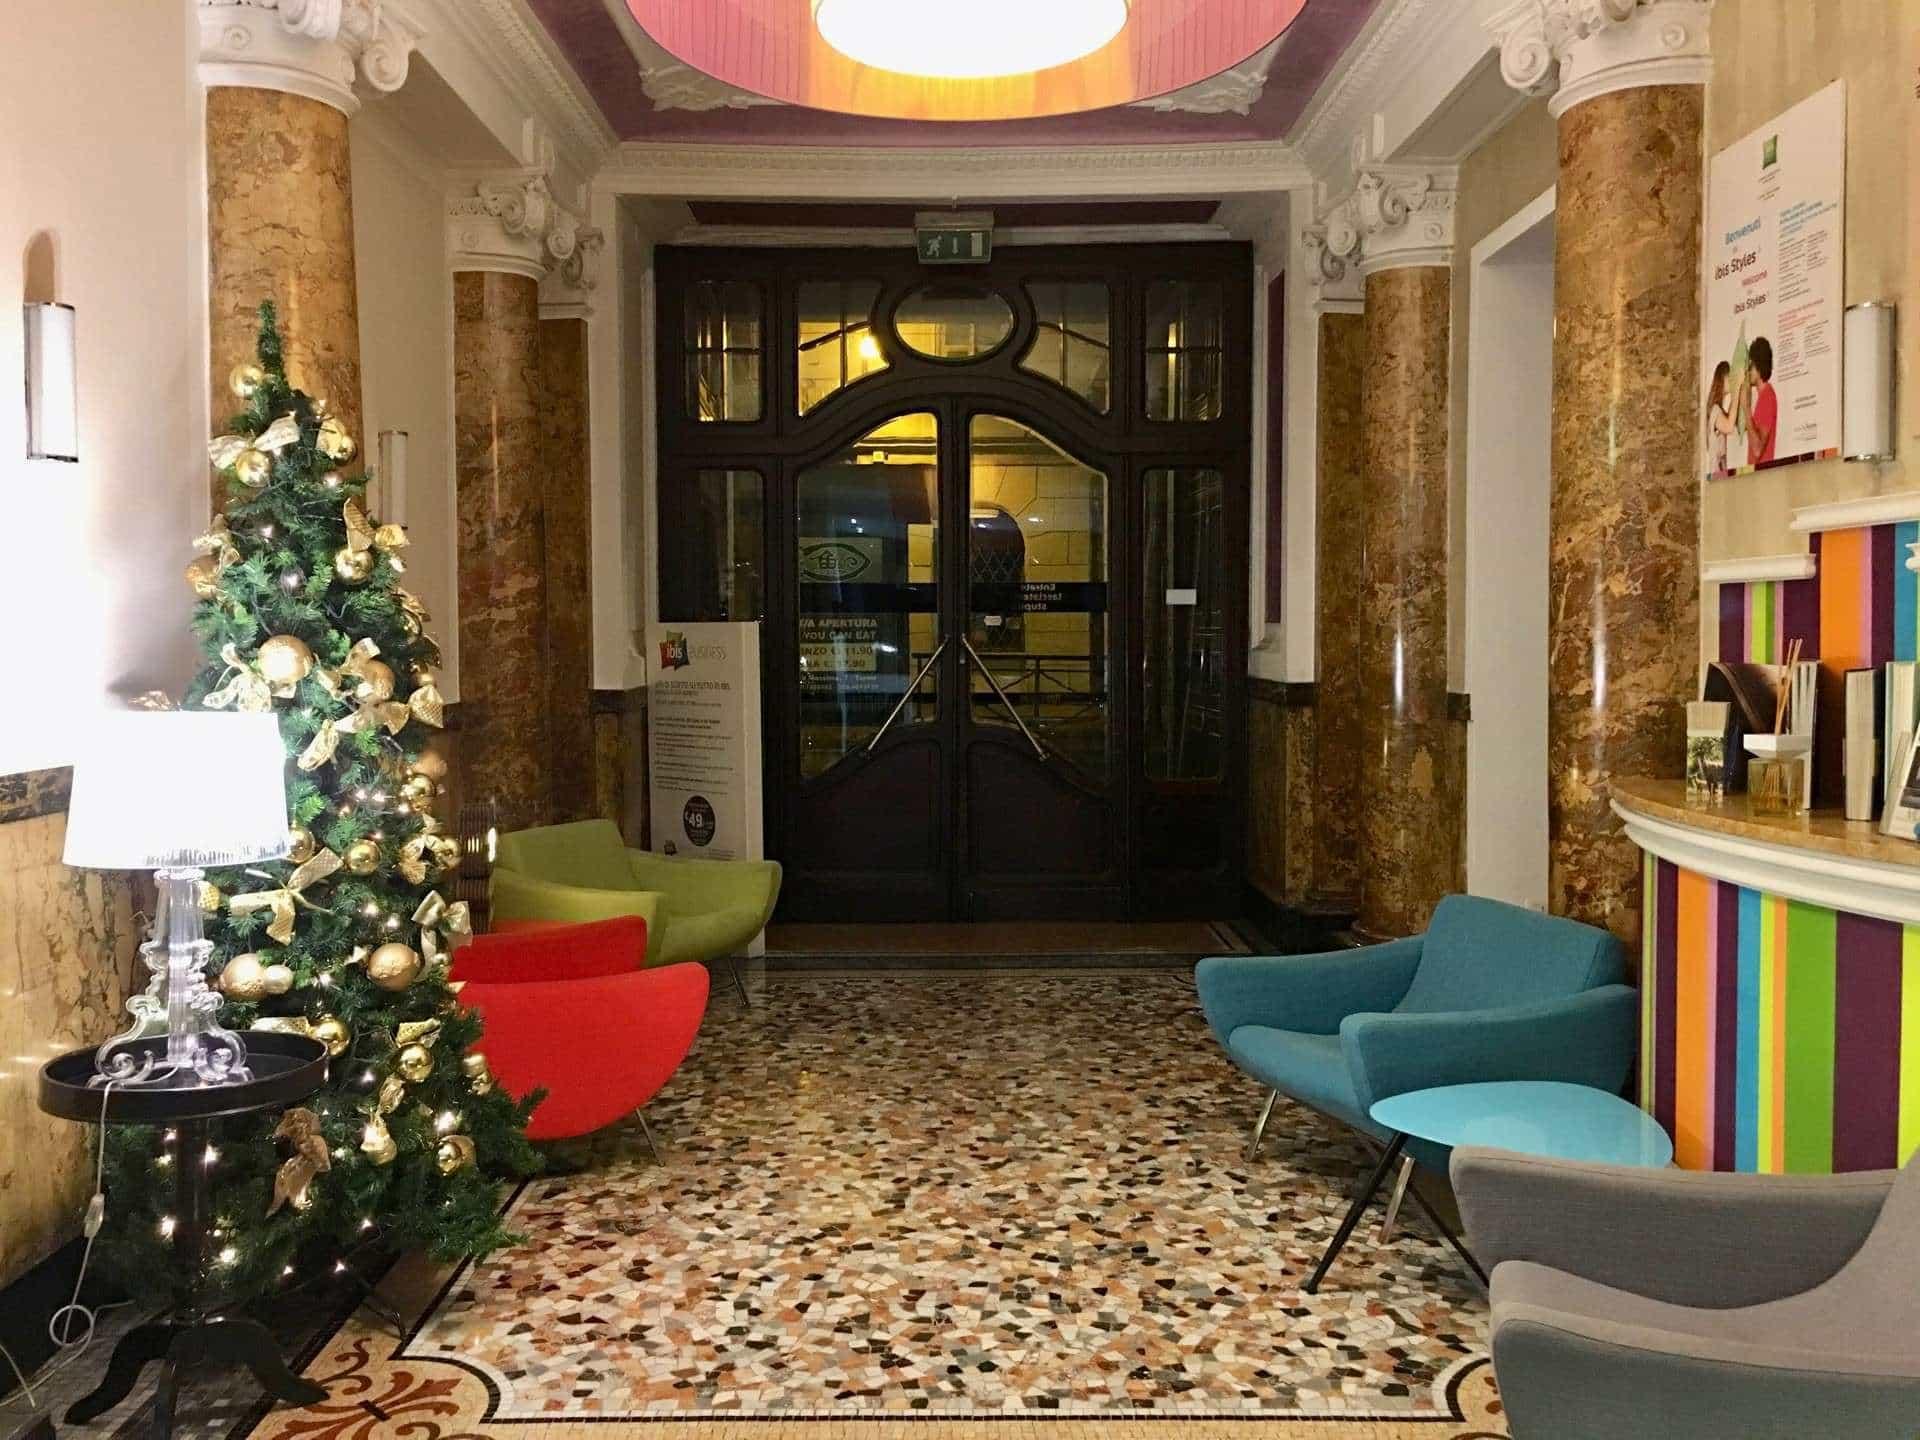 Hotel Foyer Hottingen Review : Ibis styles torino porta nuova hotel review fab meets world